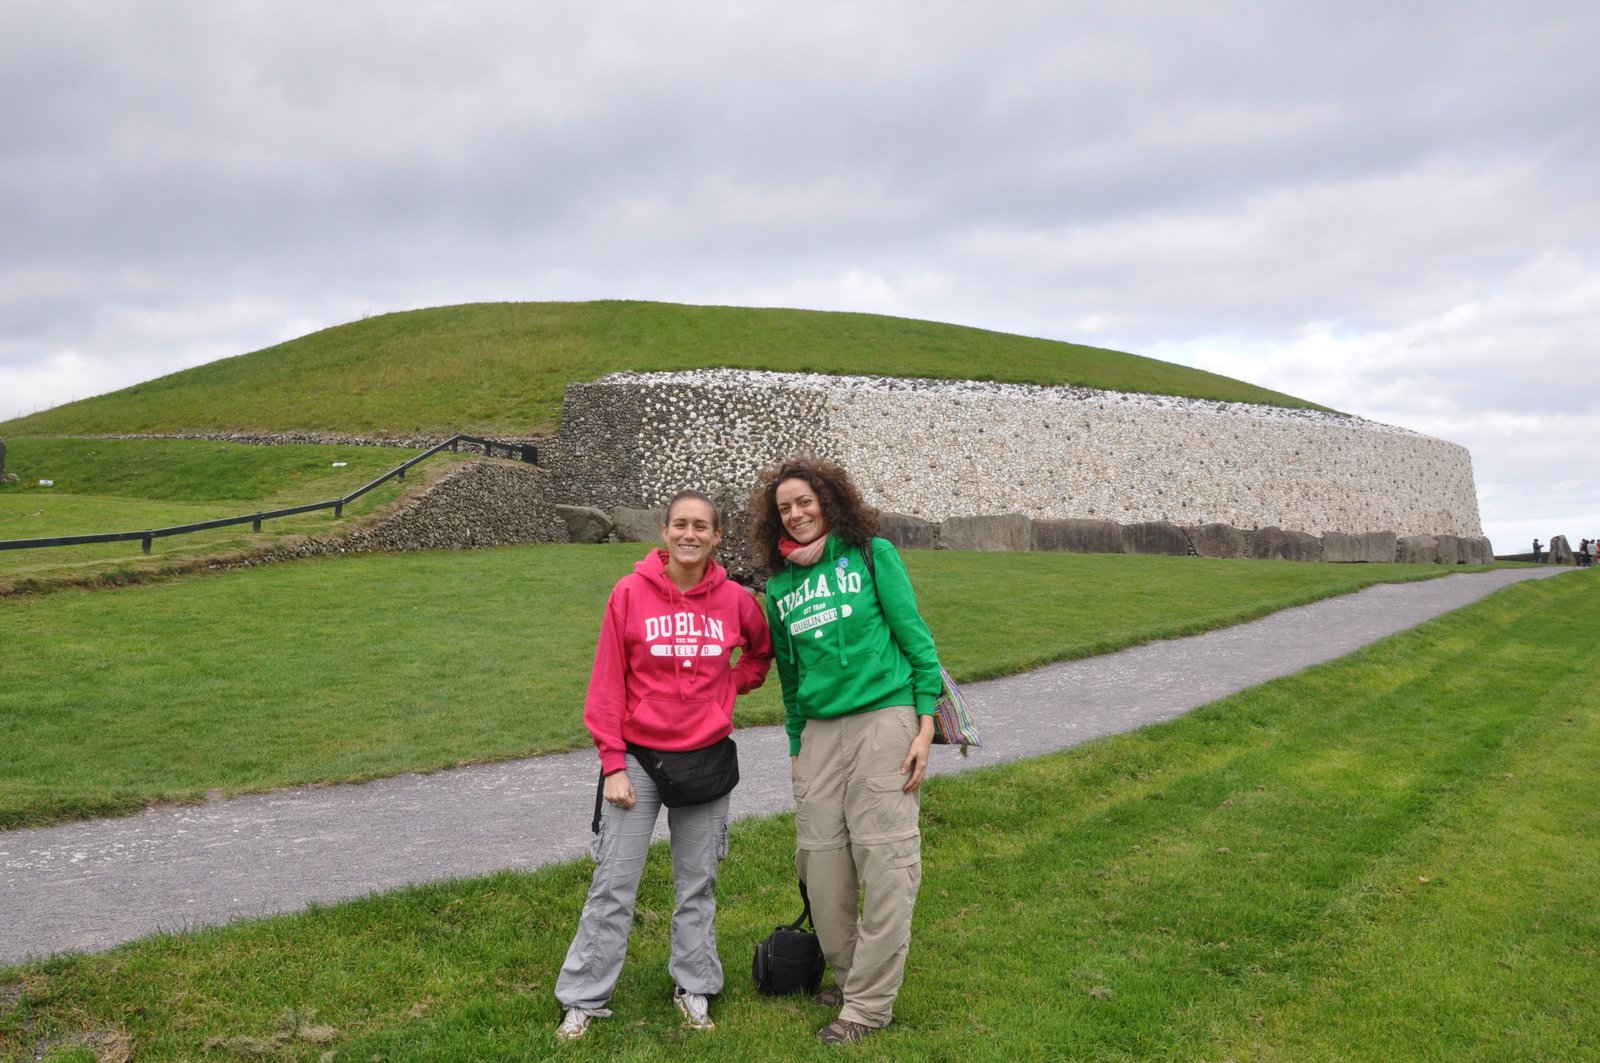 Le tumulus de Newgrange en Irlande